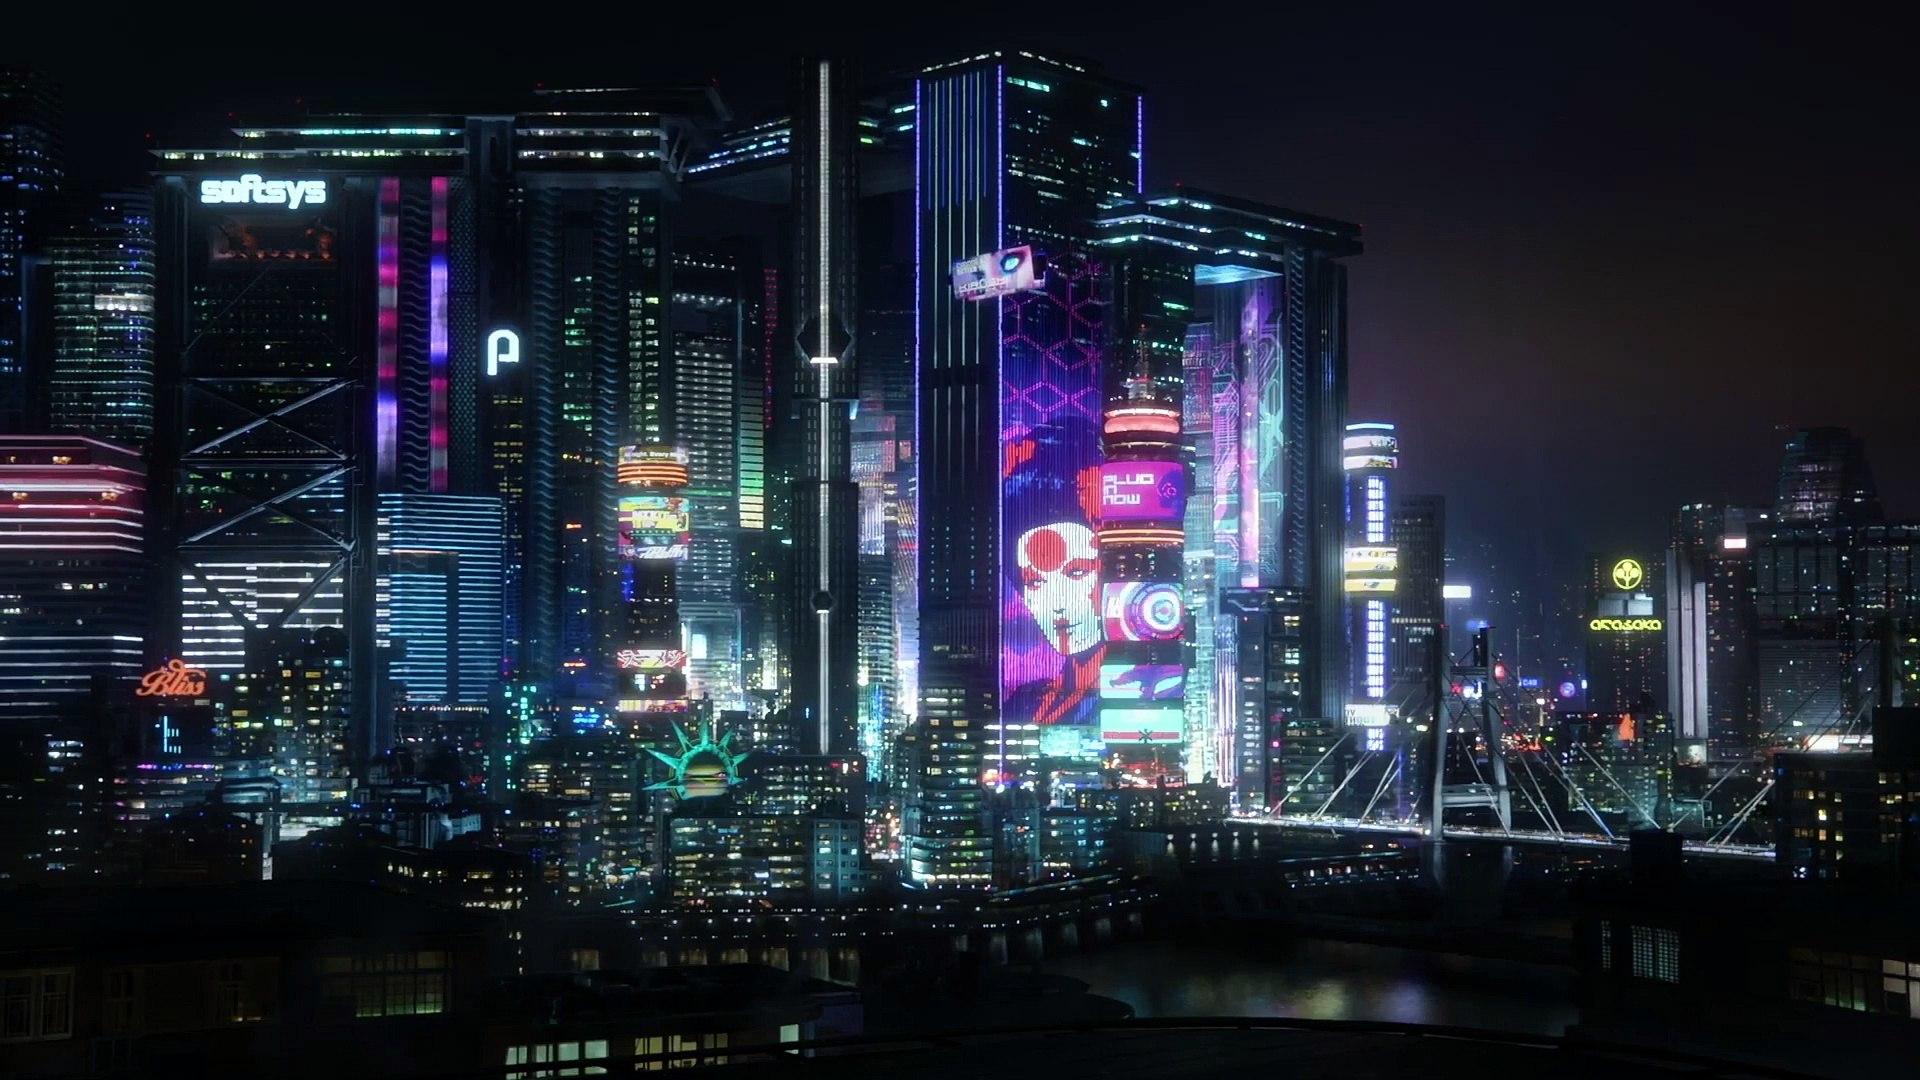 CYBERPUNK 2077 Official Trailer (2020) Keanu Reeves, E3 Game HD-1080